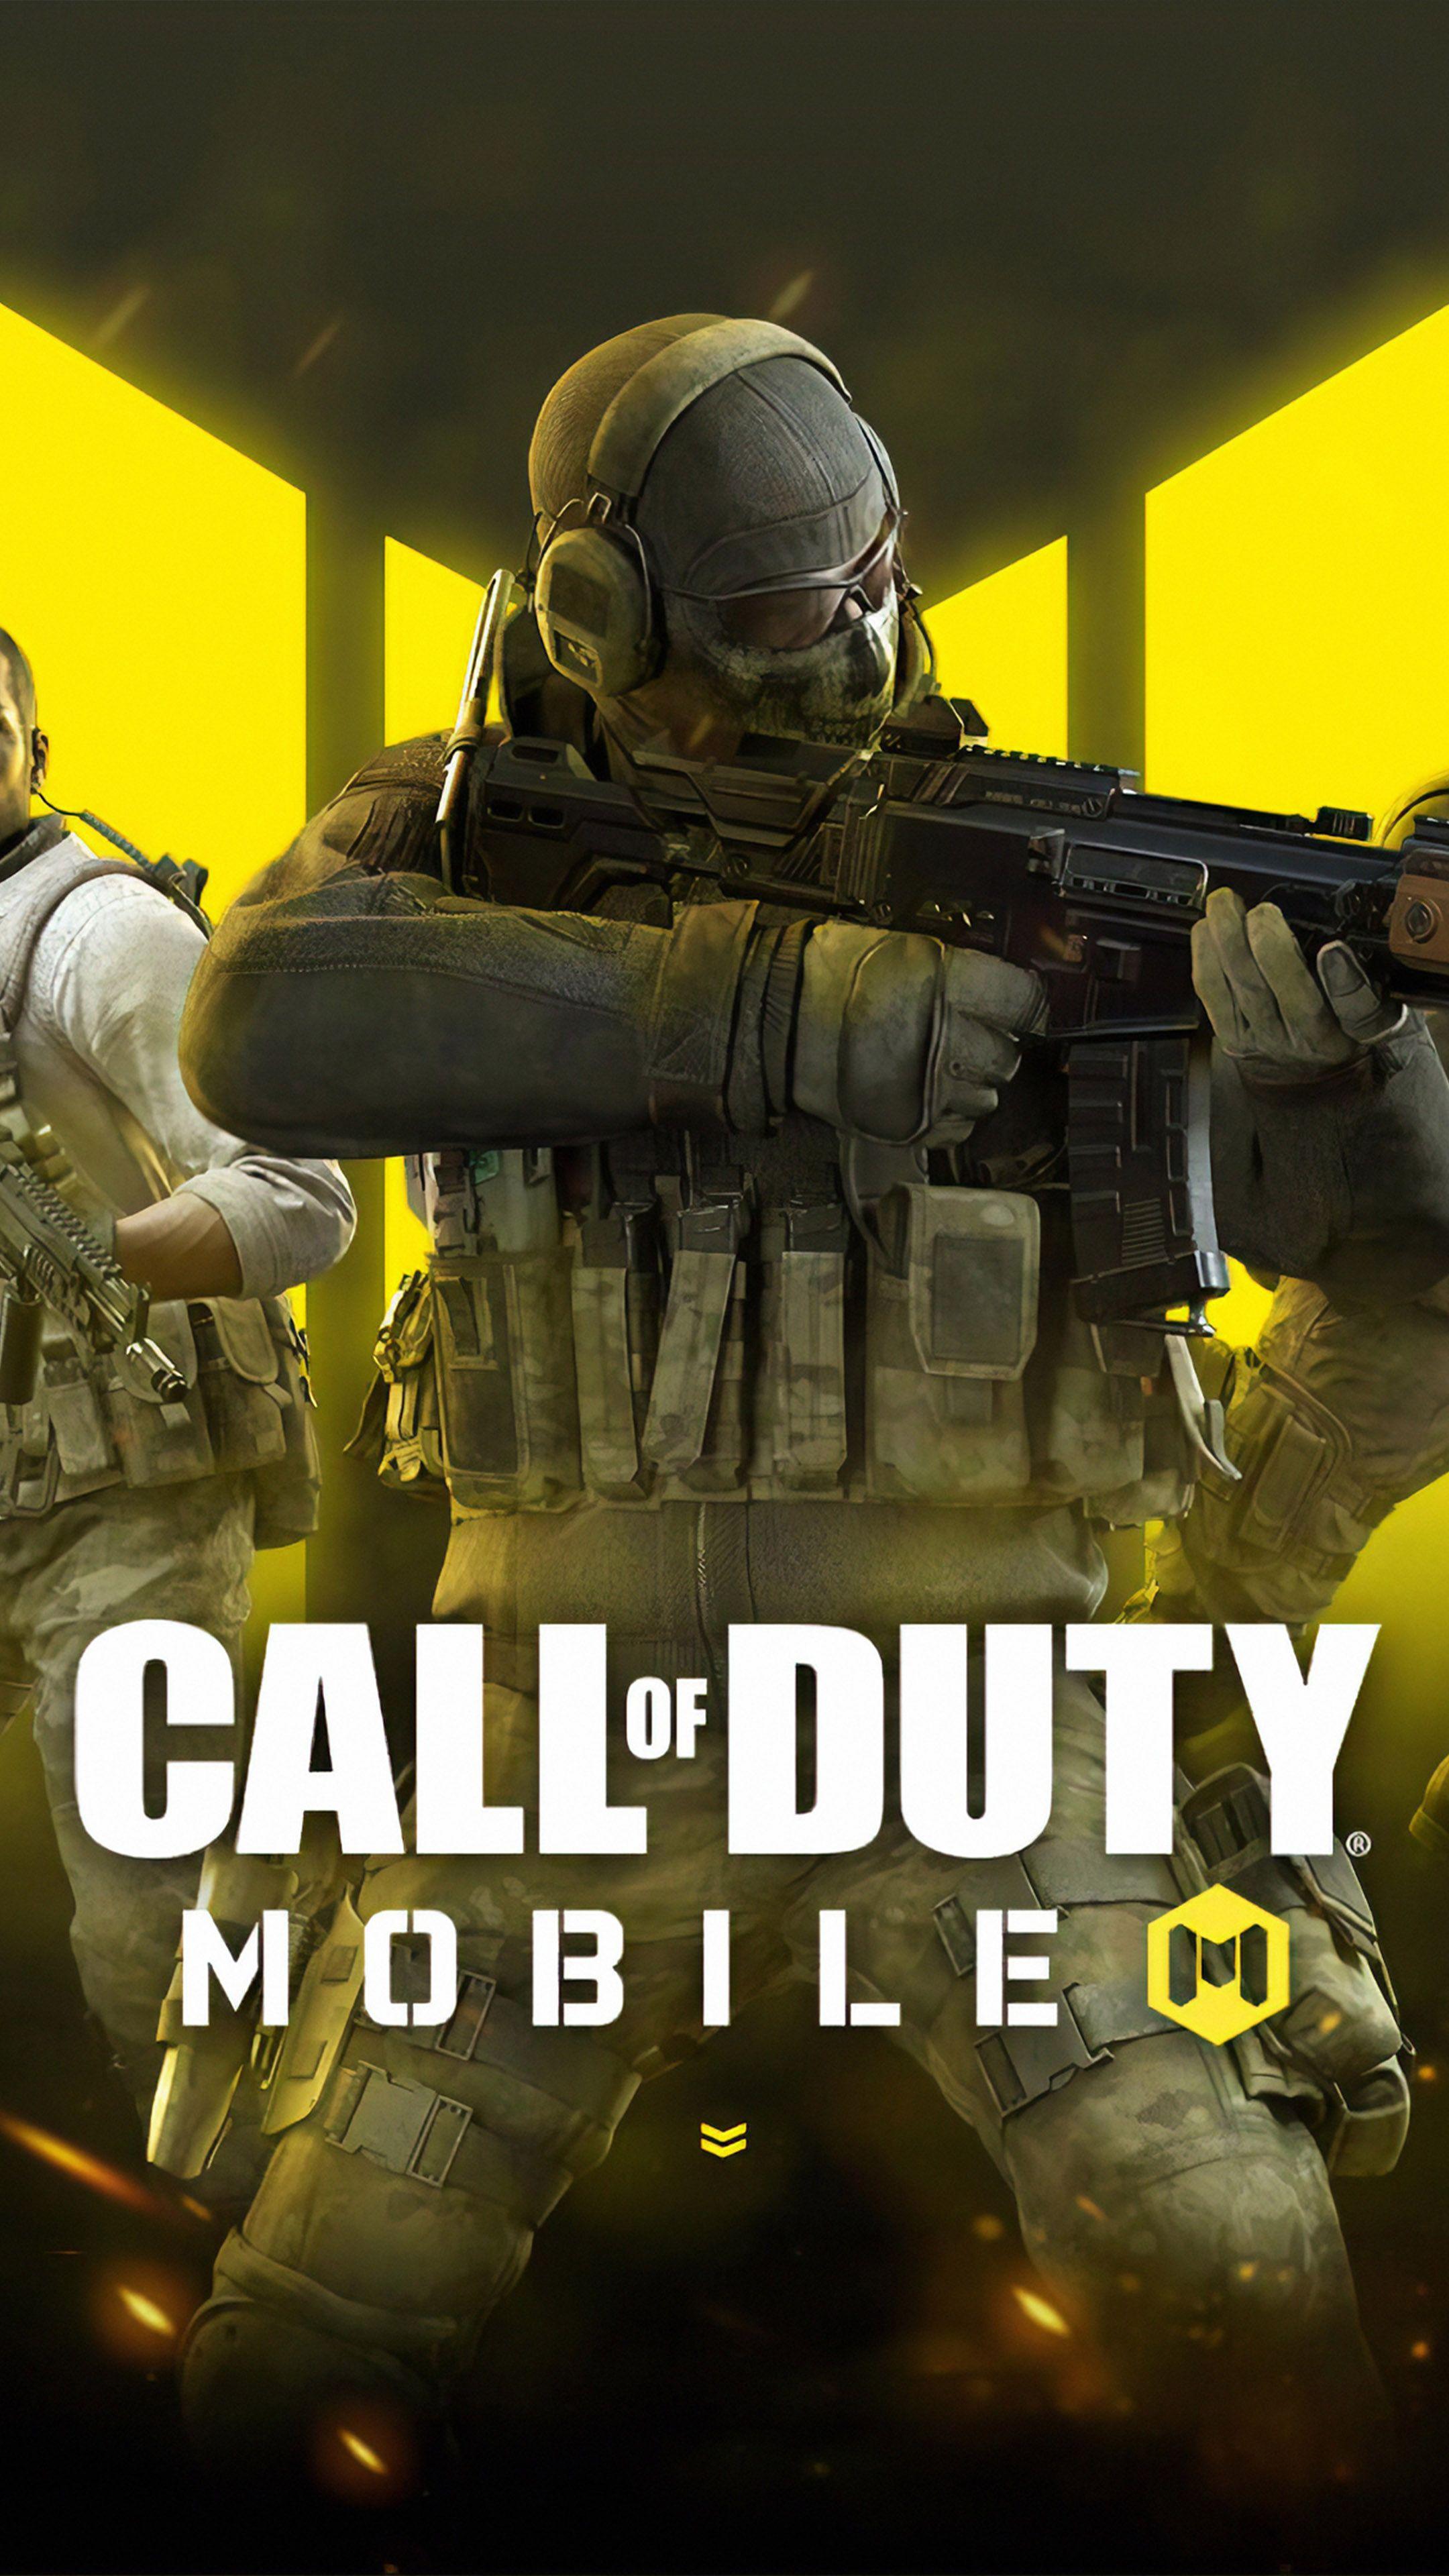 Call of Duty Mobile 2019 4K Ultra HD Mobile Wallpaper